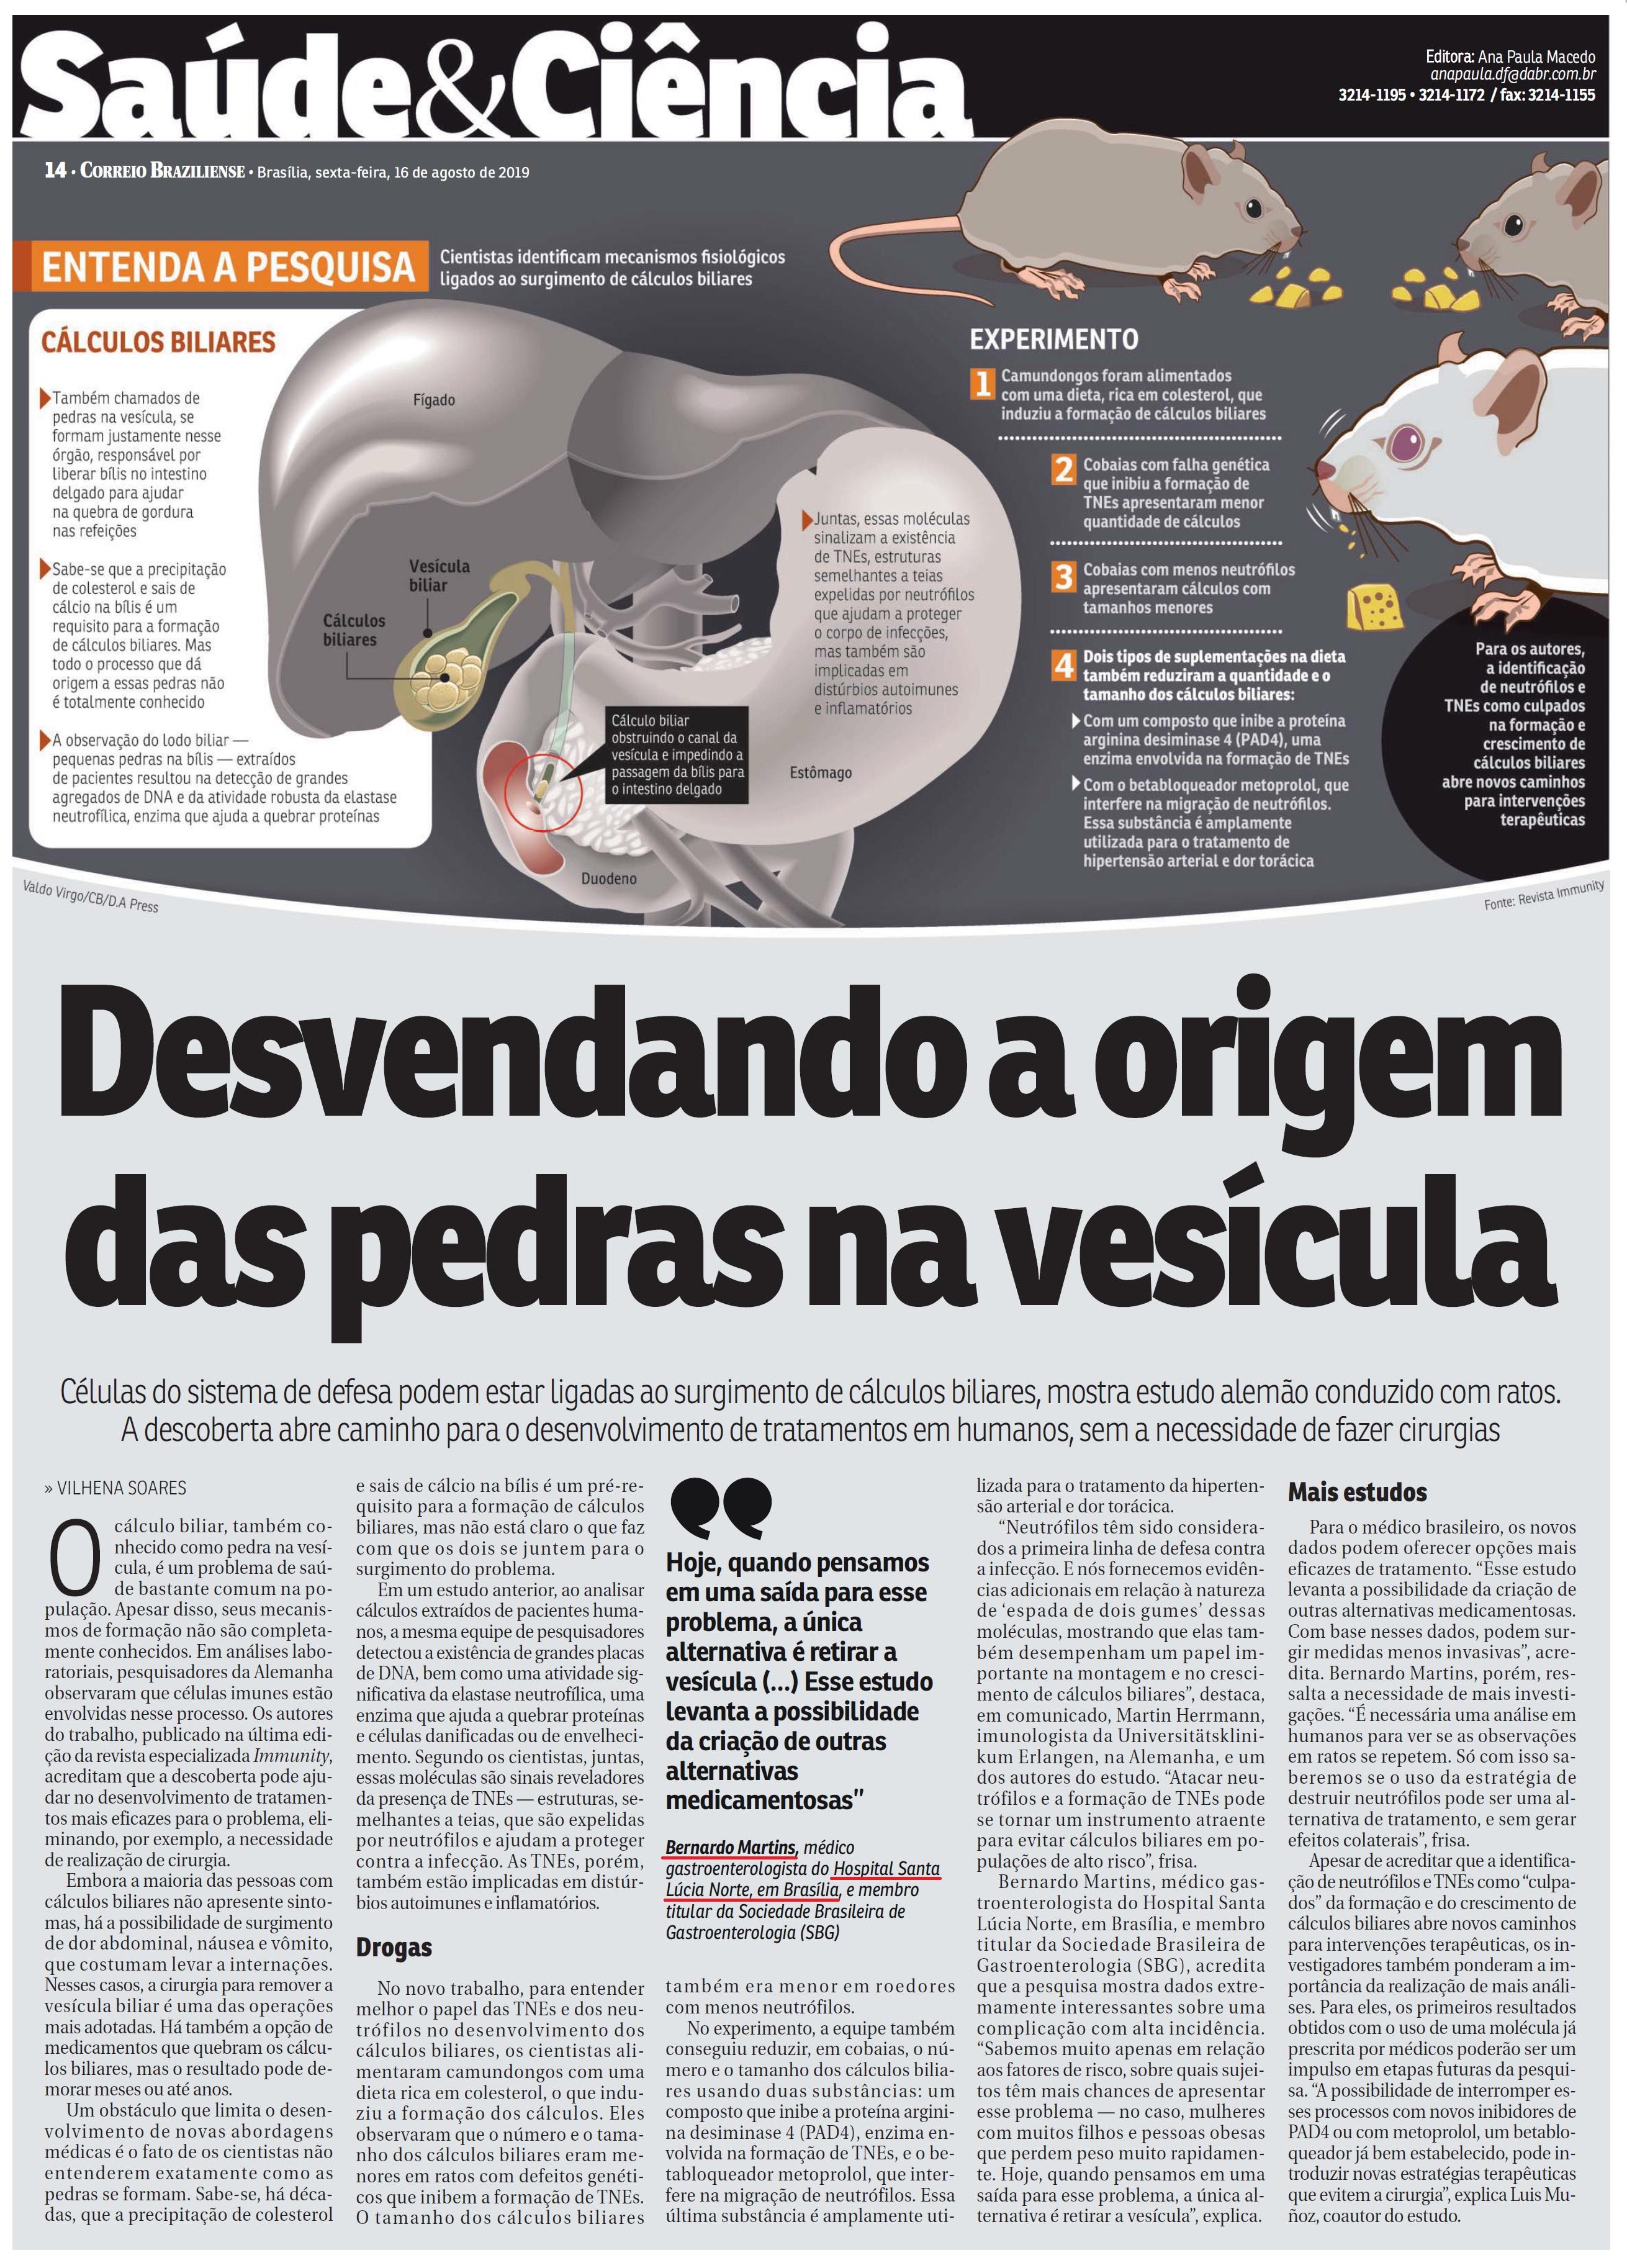 Correio Braziliense - Dr. Bernardo Martins HSLN - 16-08-2019